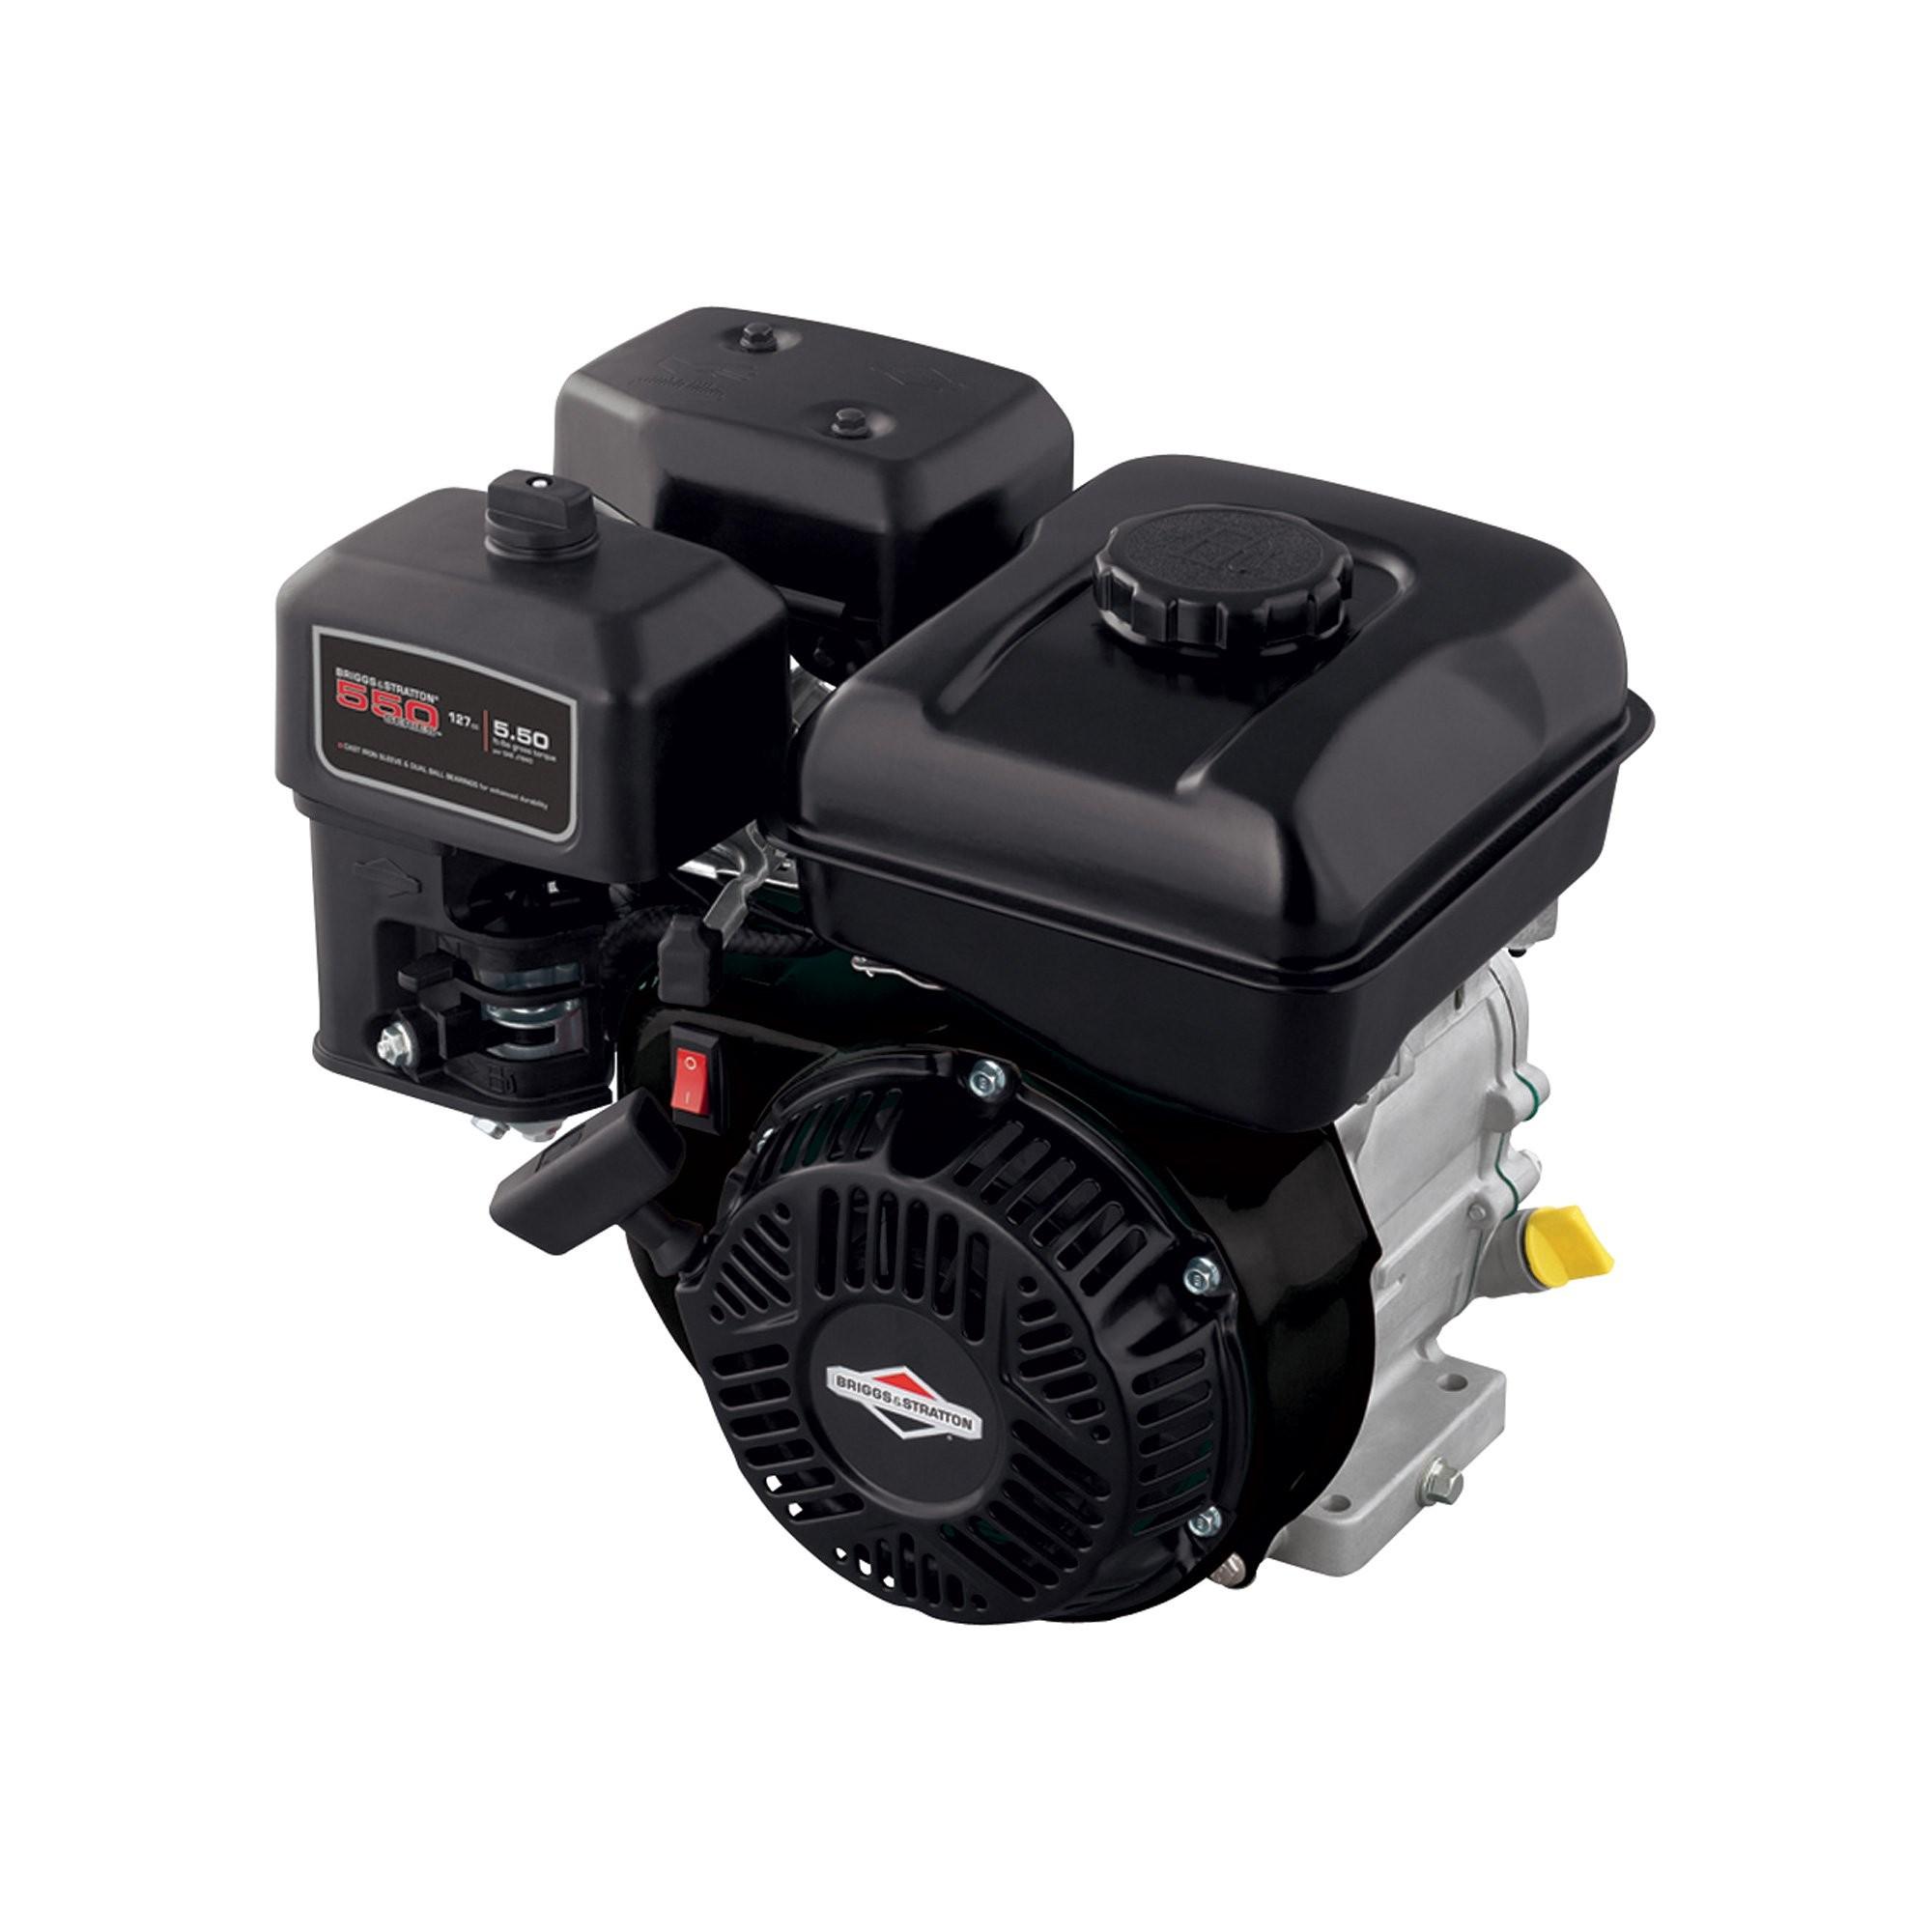 hight resolution of briggs and stratton 3 75 hp engine diagram briggs stratton 550 series horizontal ohv engine